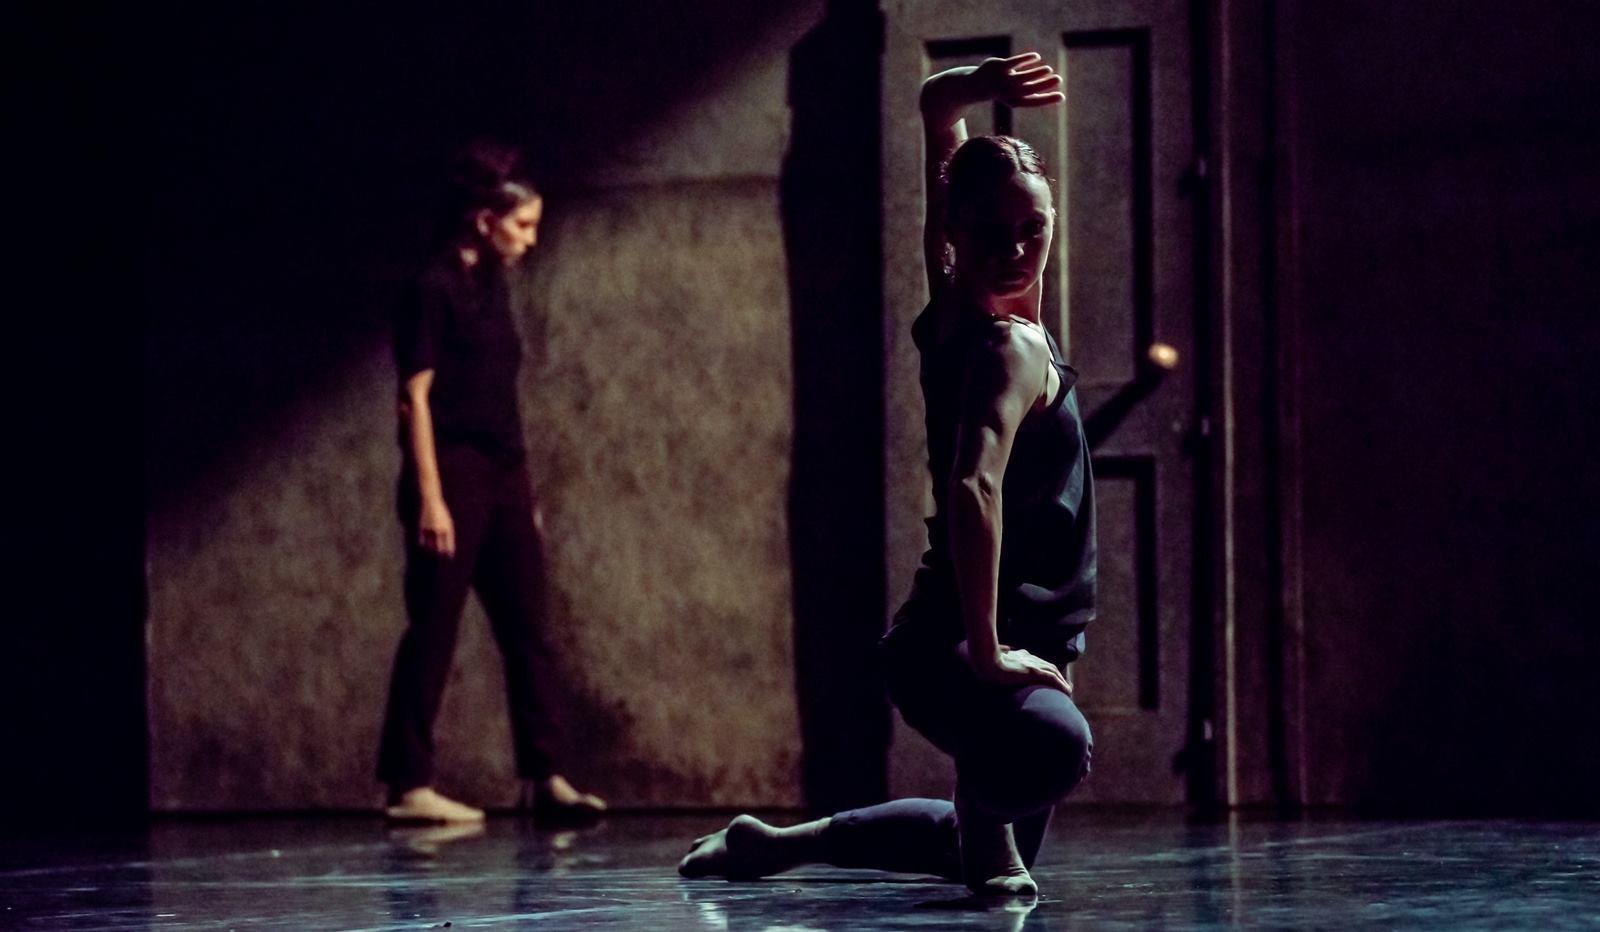 Baletna predstava '4 bolera' u HNK Ivana pl. Zajca